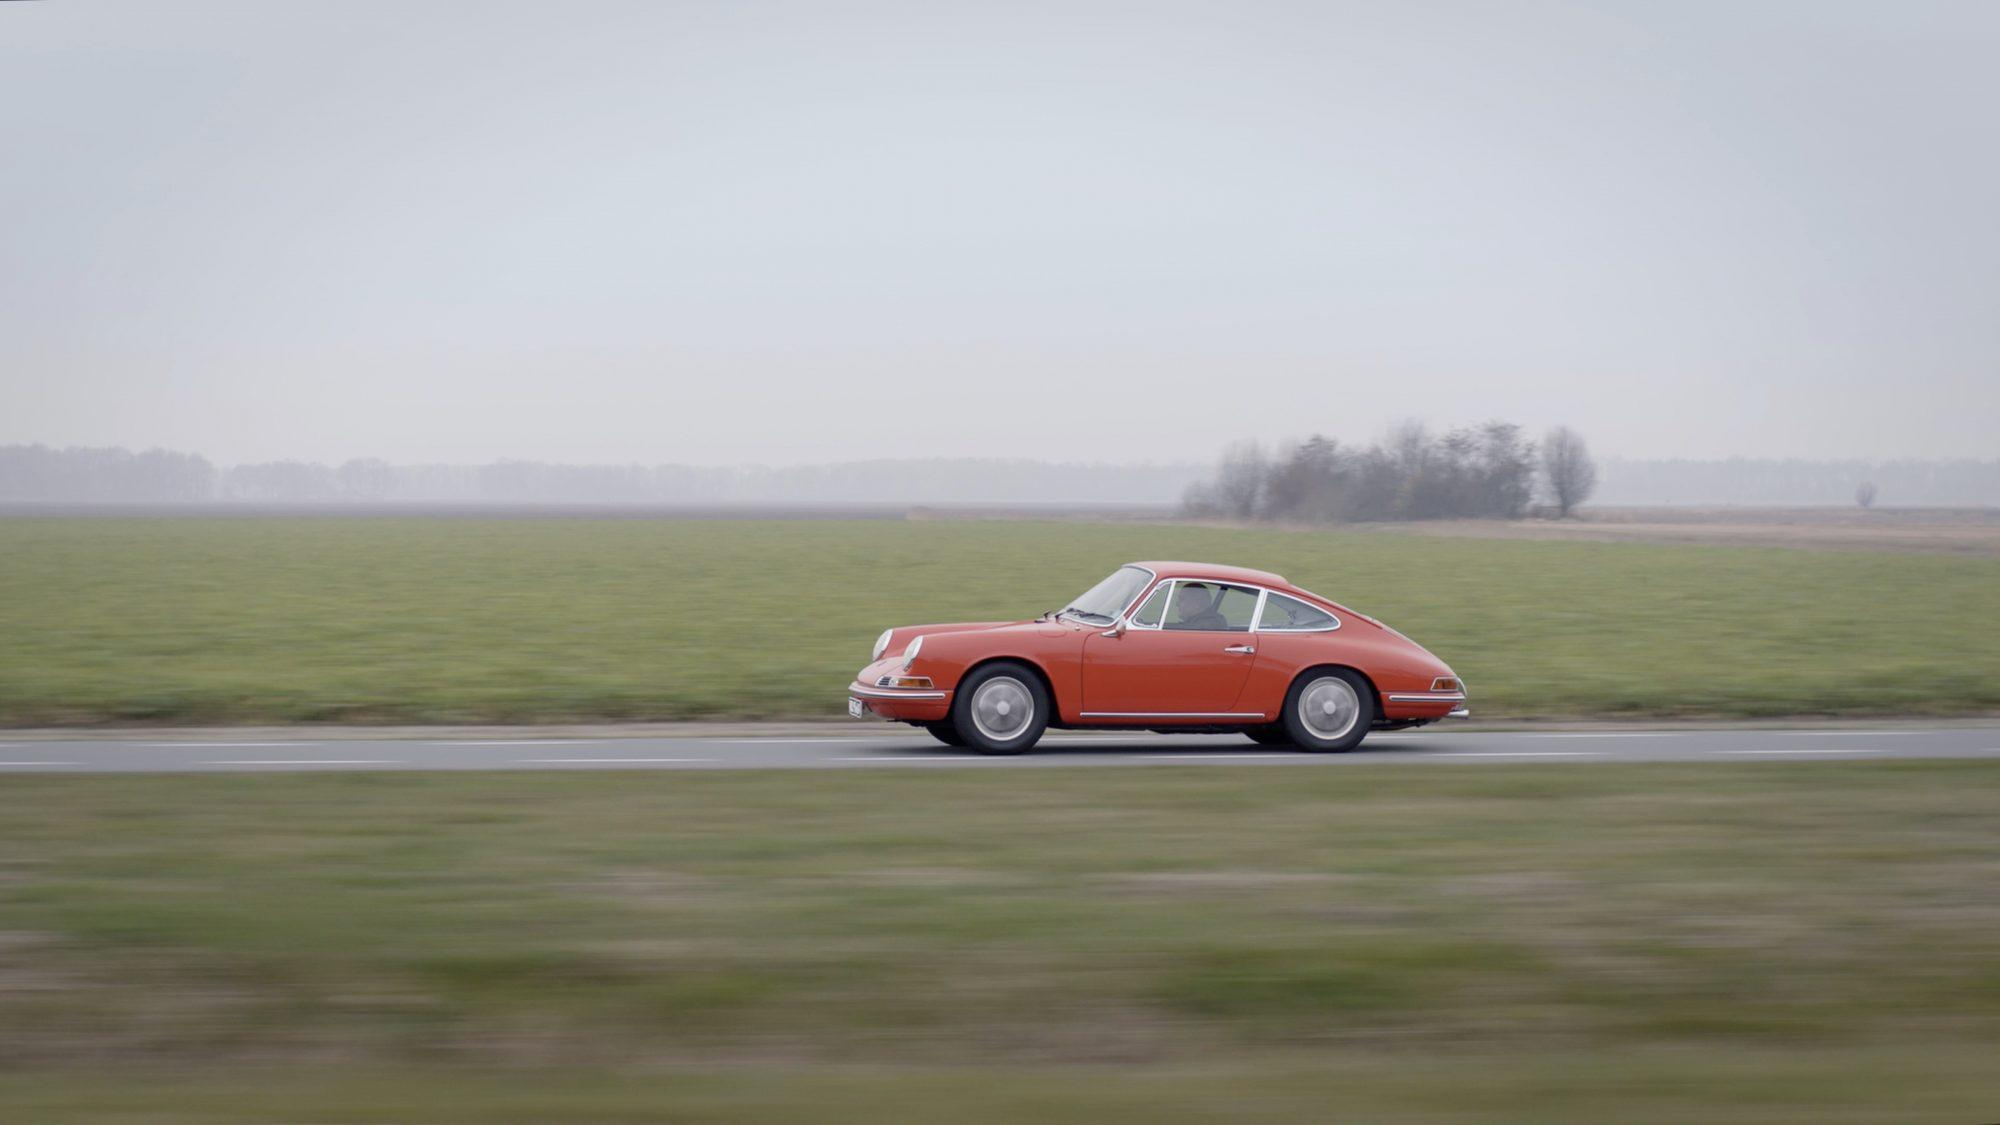 Vintage cars - Porsche Portraits, an eight-part series of